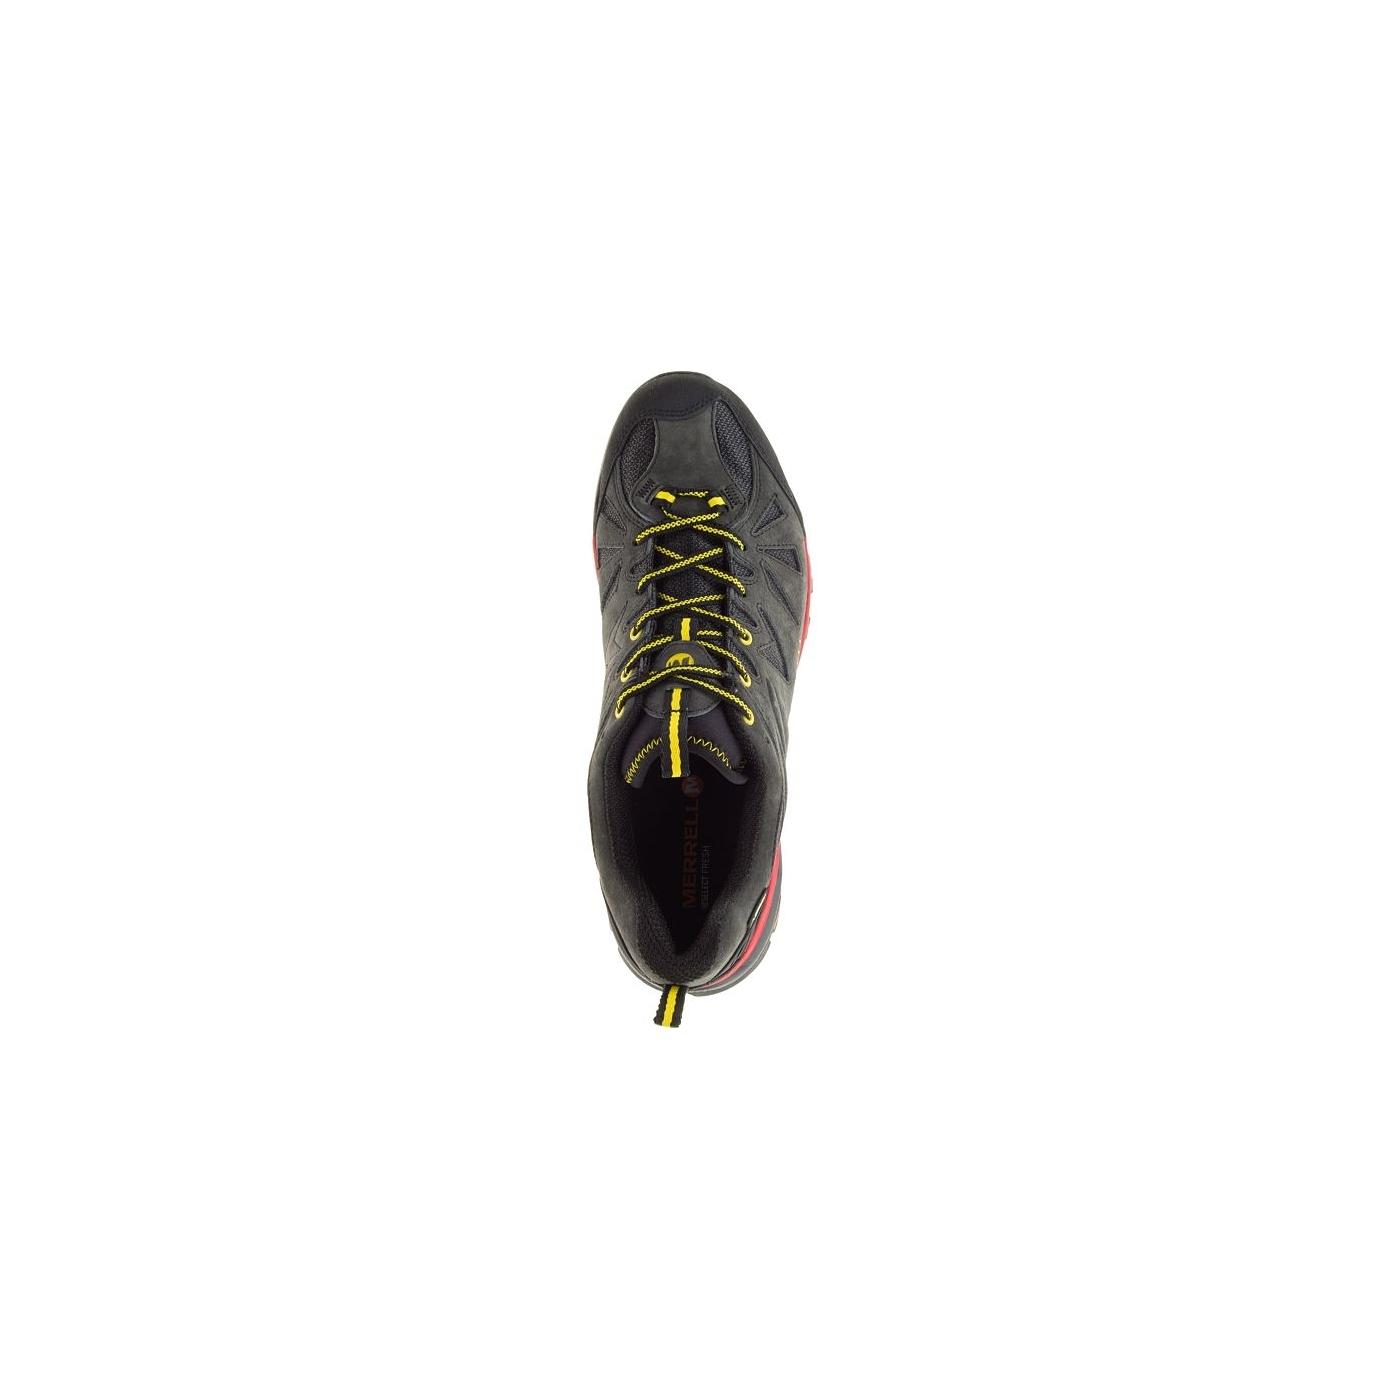 Chaussures Randonnée Merrell Capra Gtx Granite